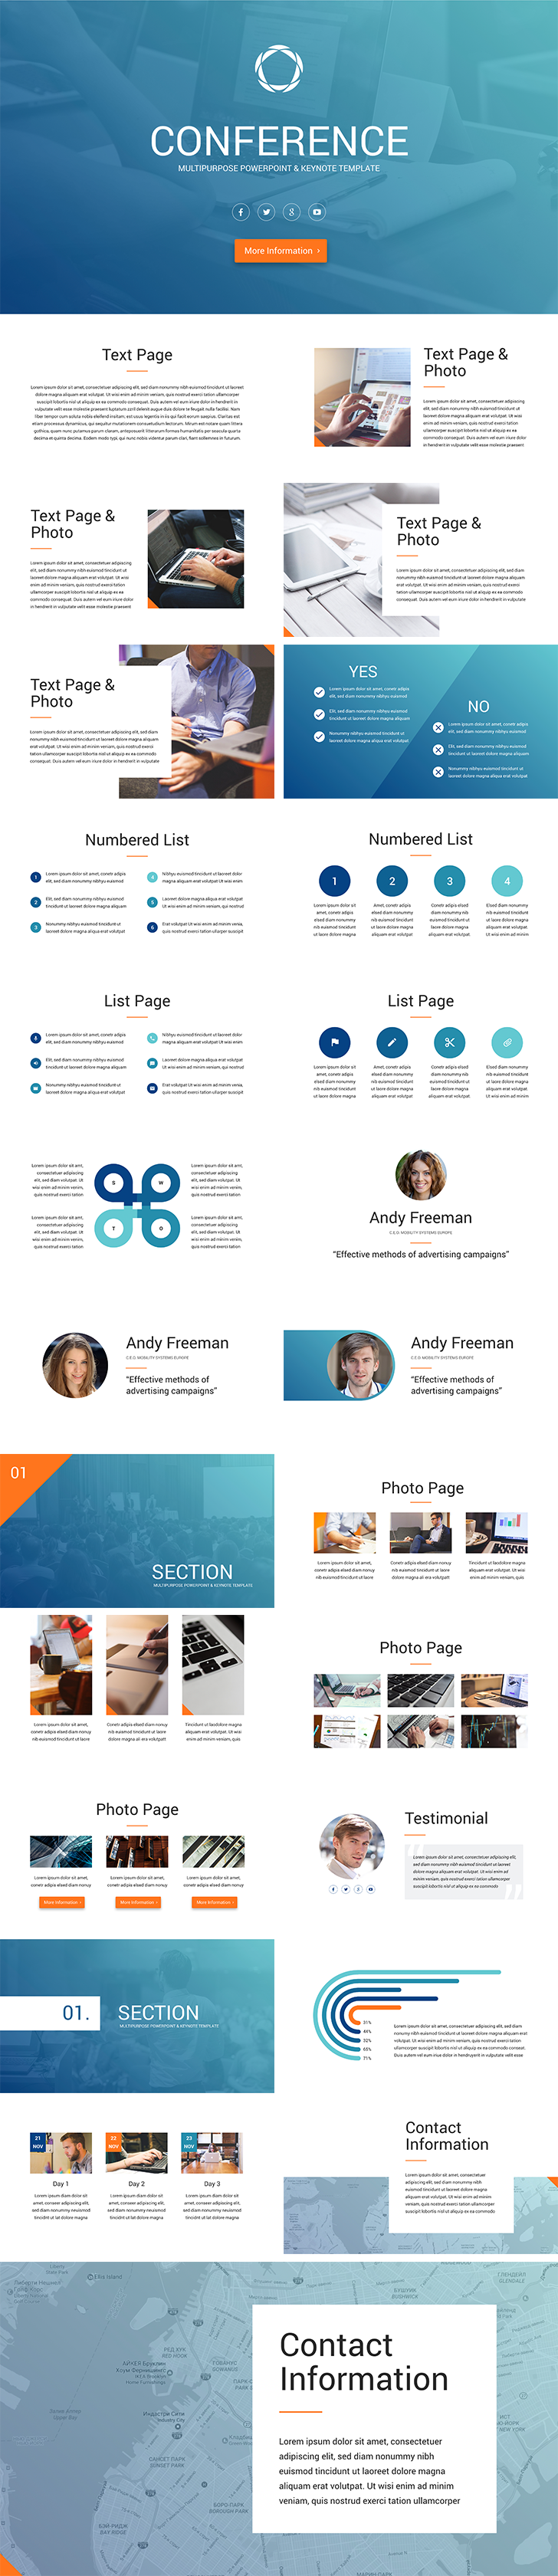 Conference Keynote Template | Presentations | Pinterest ...